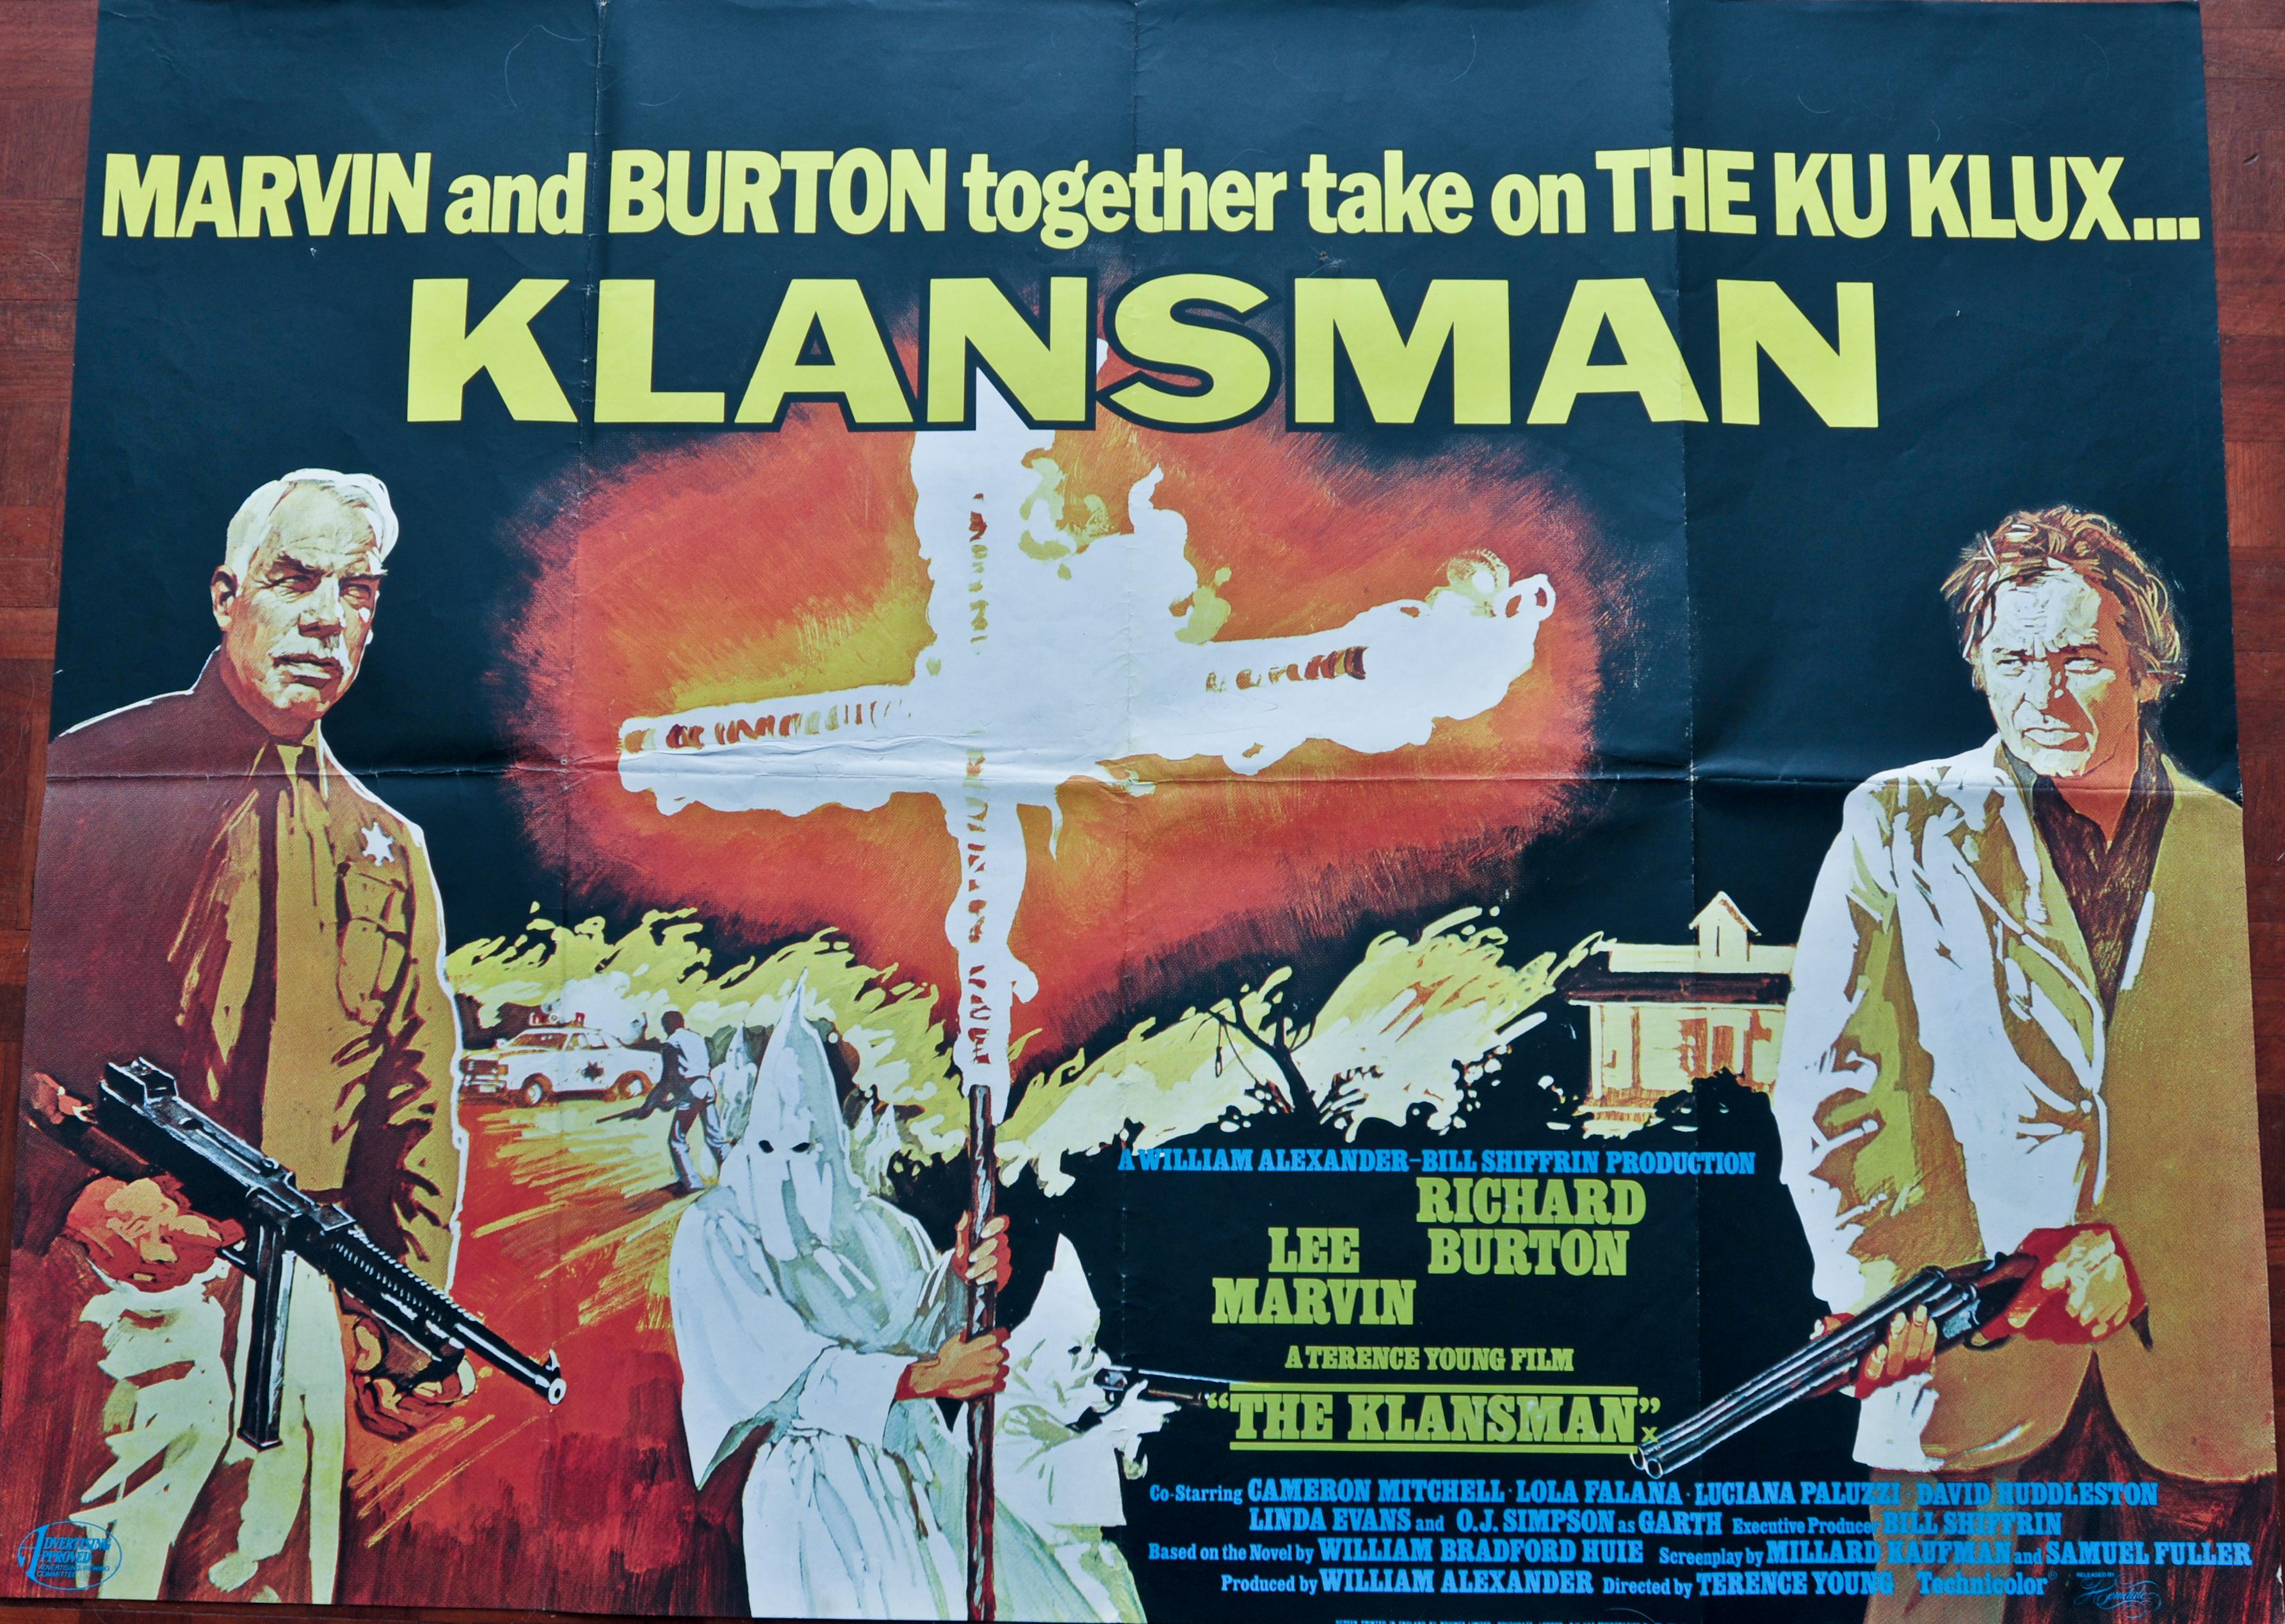 An opinion that the ku klux klan is a terrorist organization